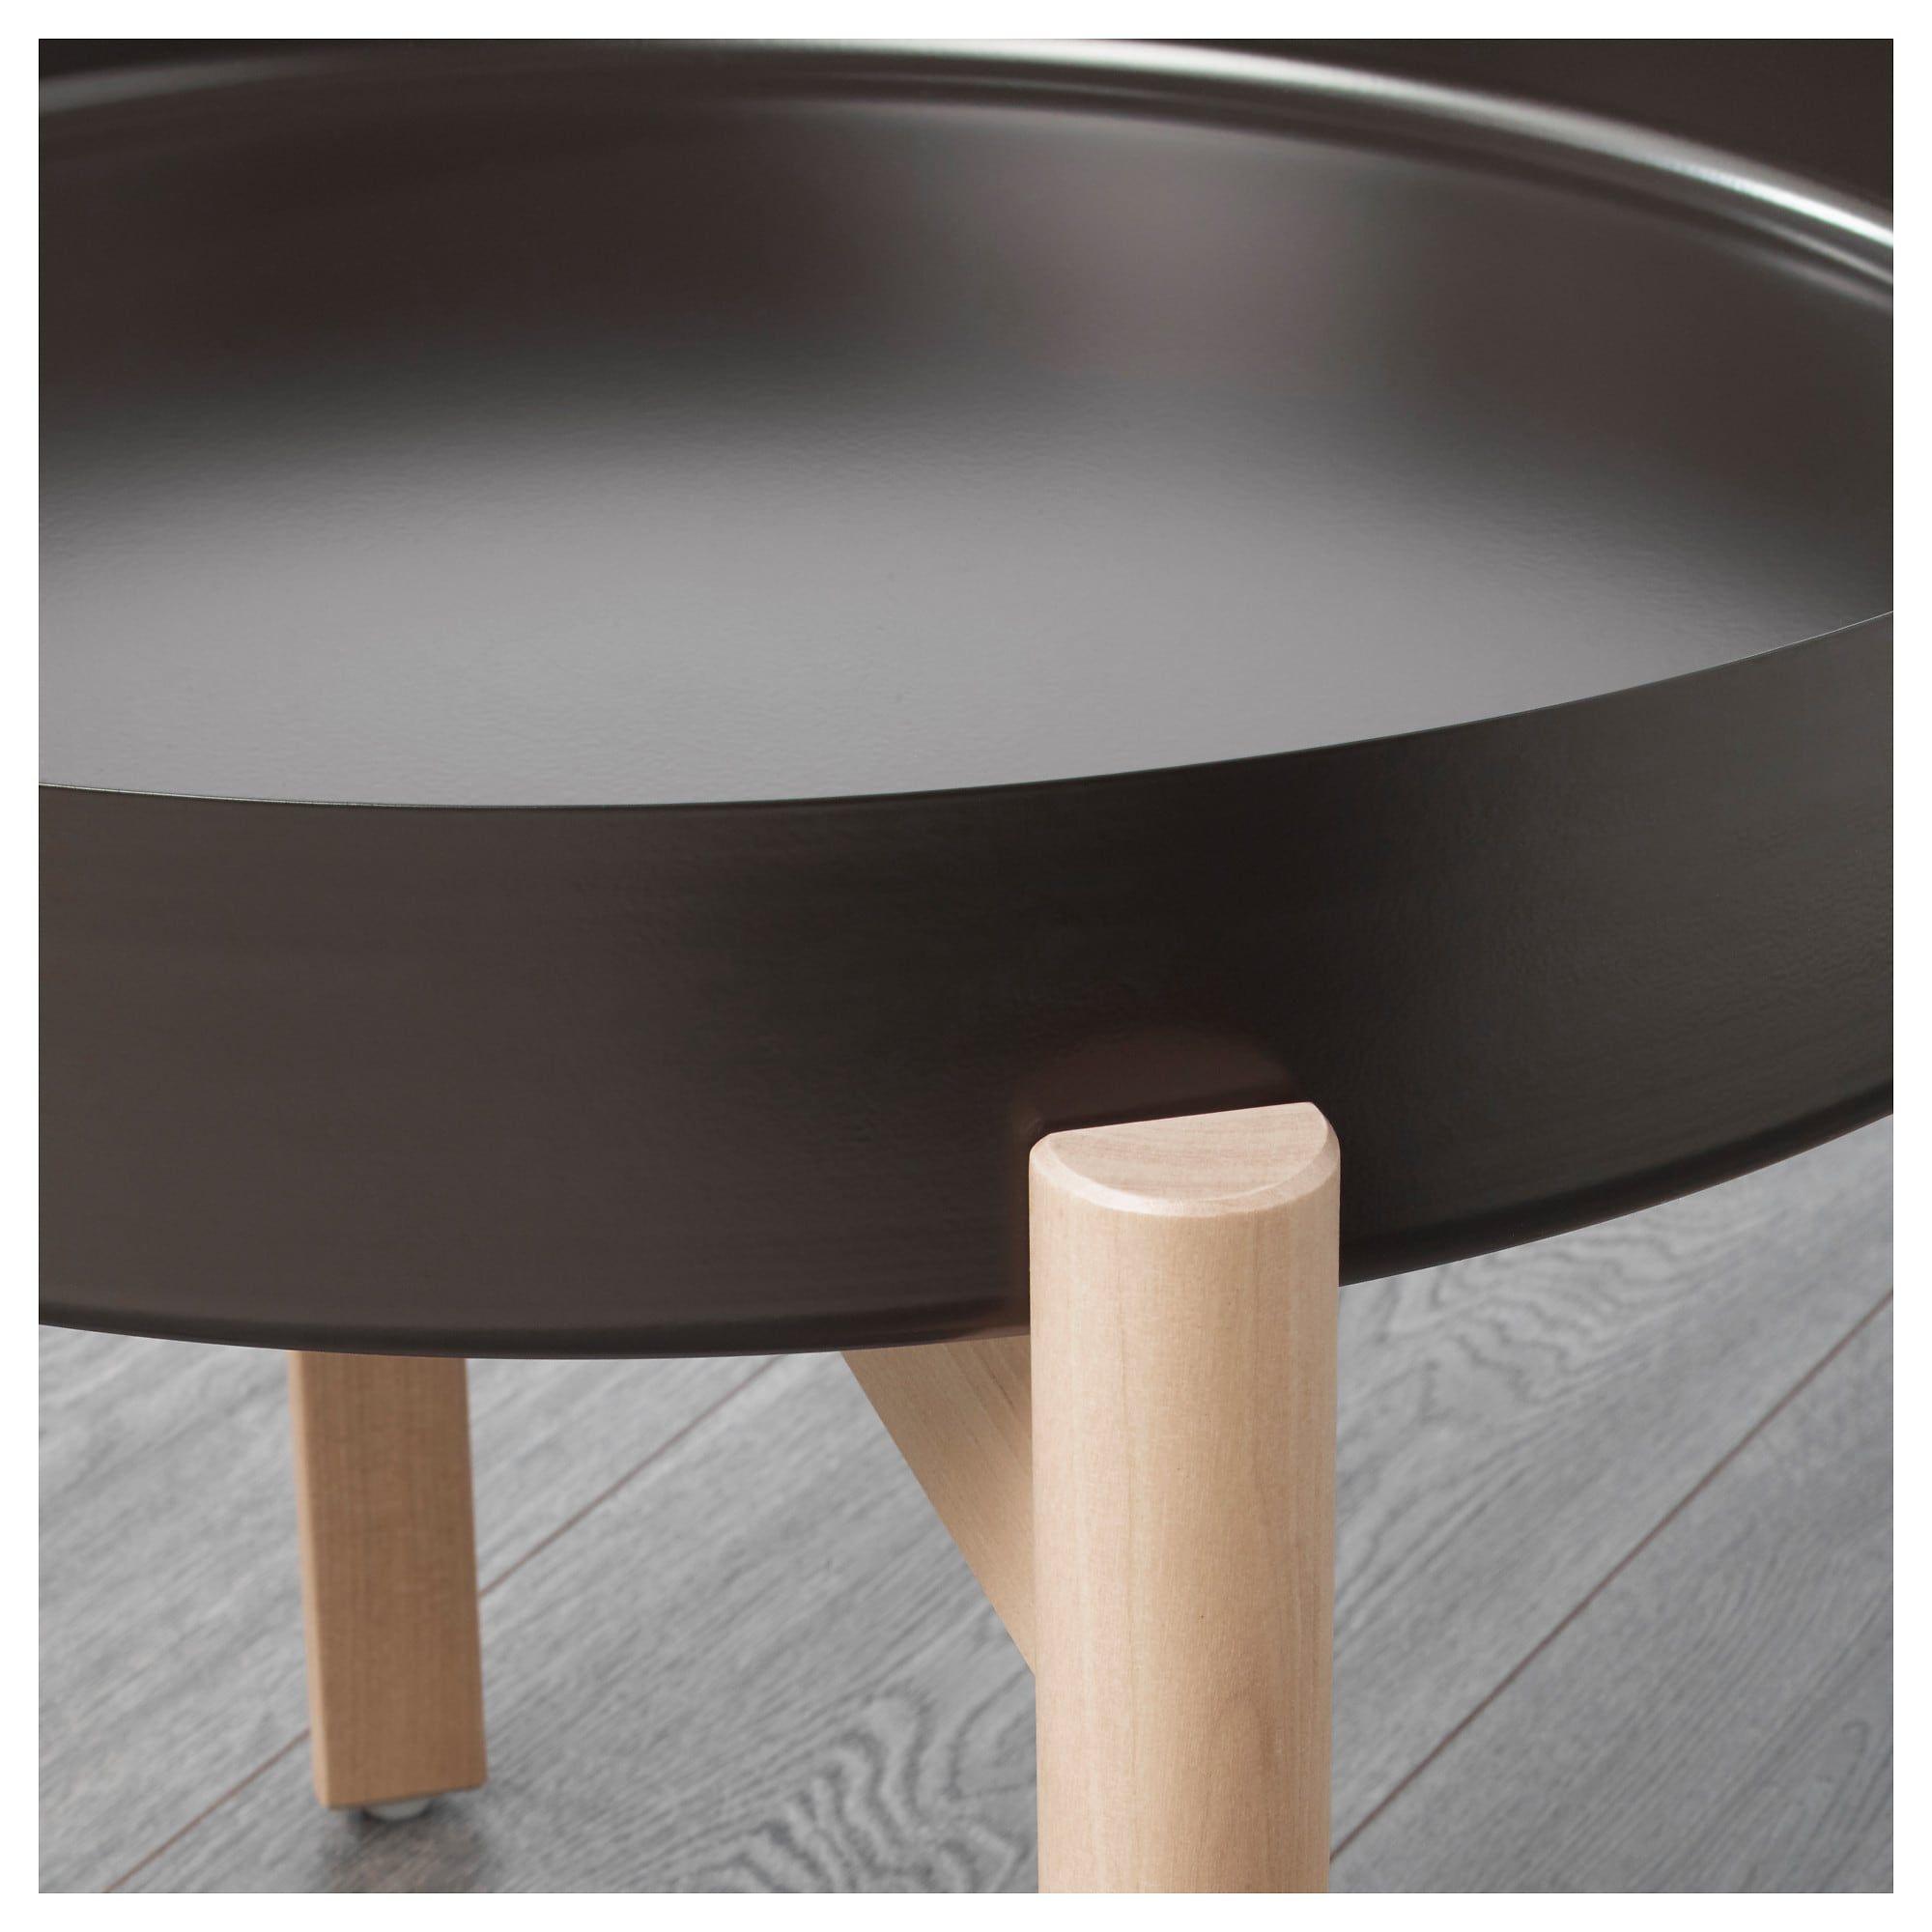 Ikea Ypperlig Dark Gray Birch Coffee Table Ikea Coffee Table Ikea Ypperlig Ikea